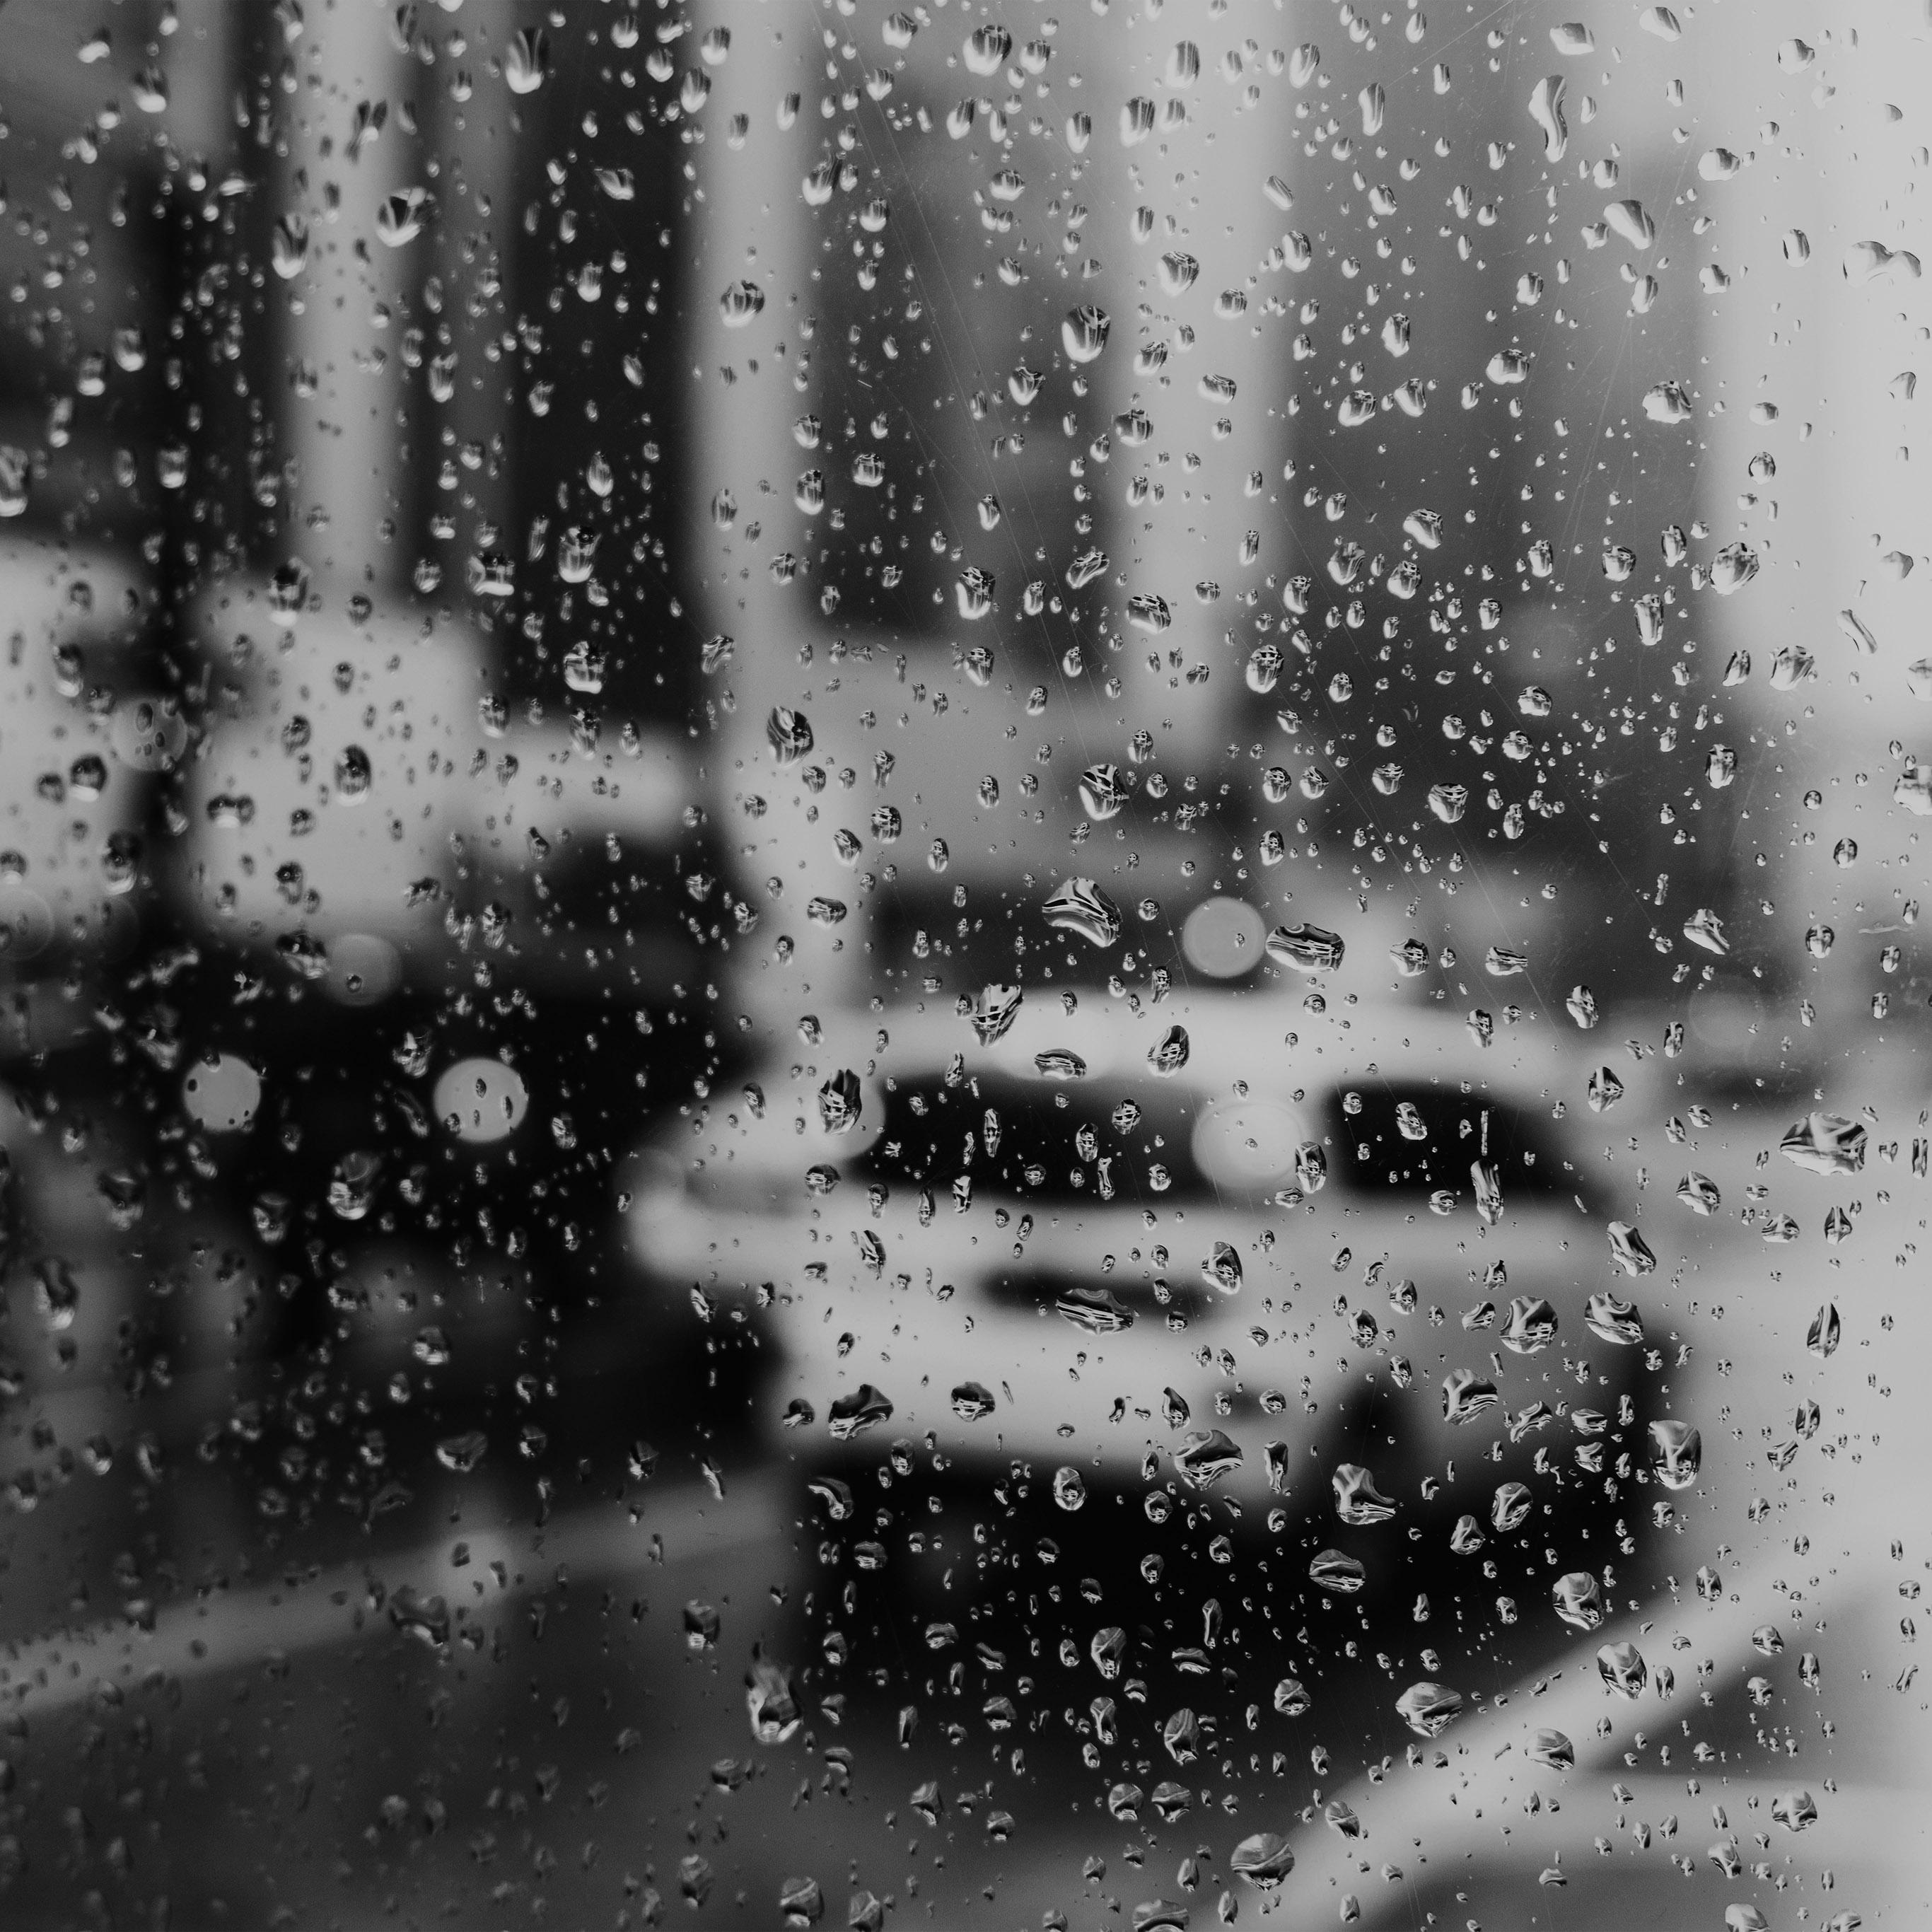 Nj02 Rain Window Bokeh Art Car Sad Bw Dark Wallpaper